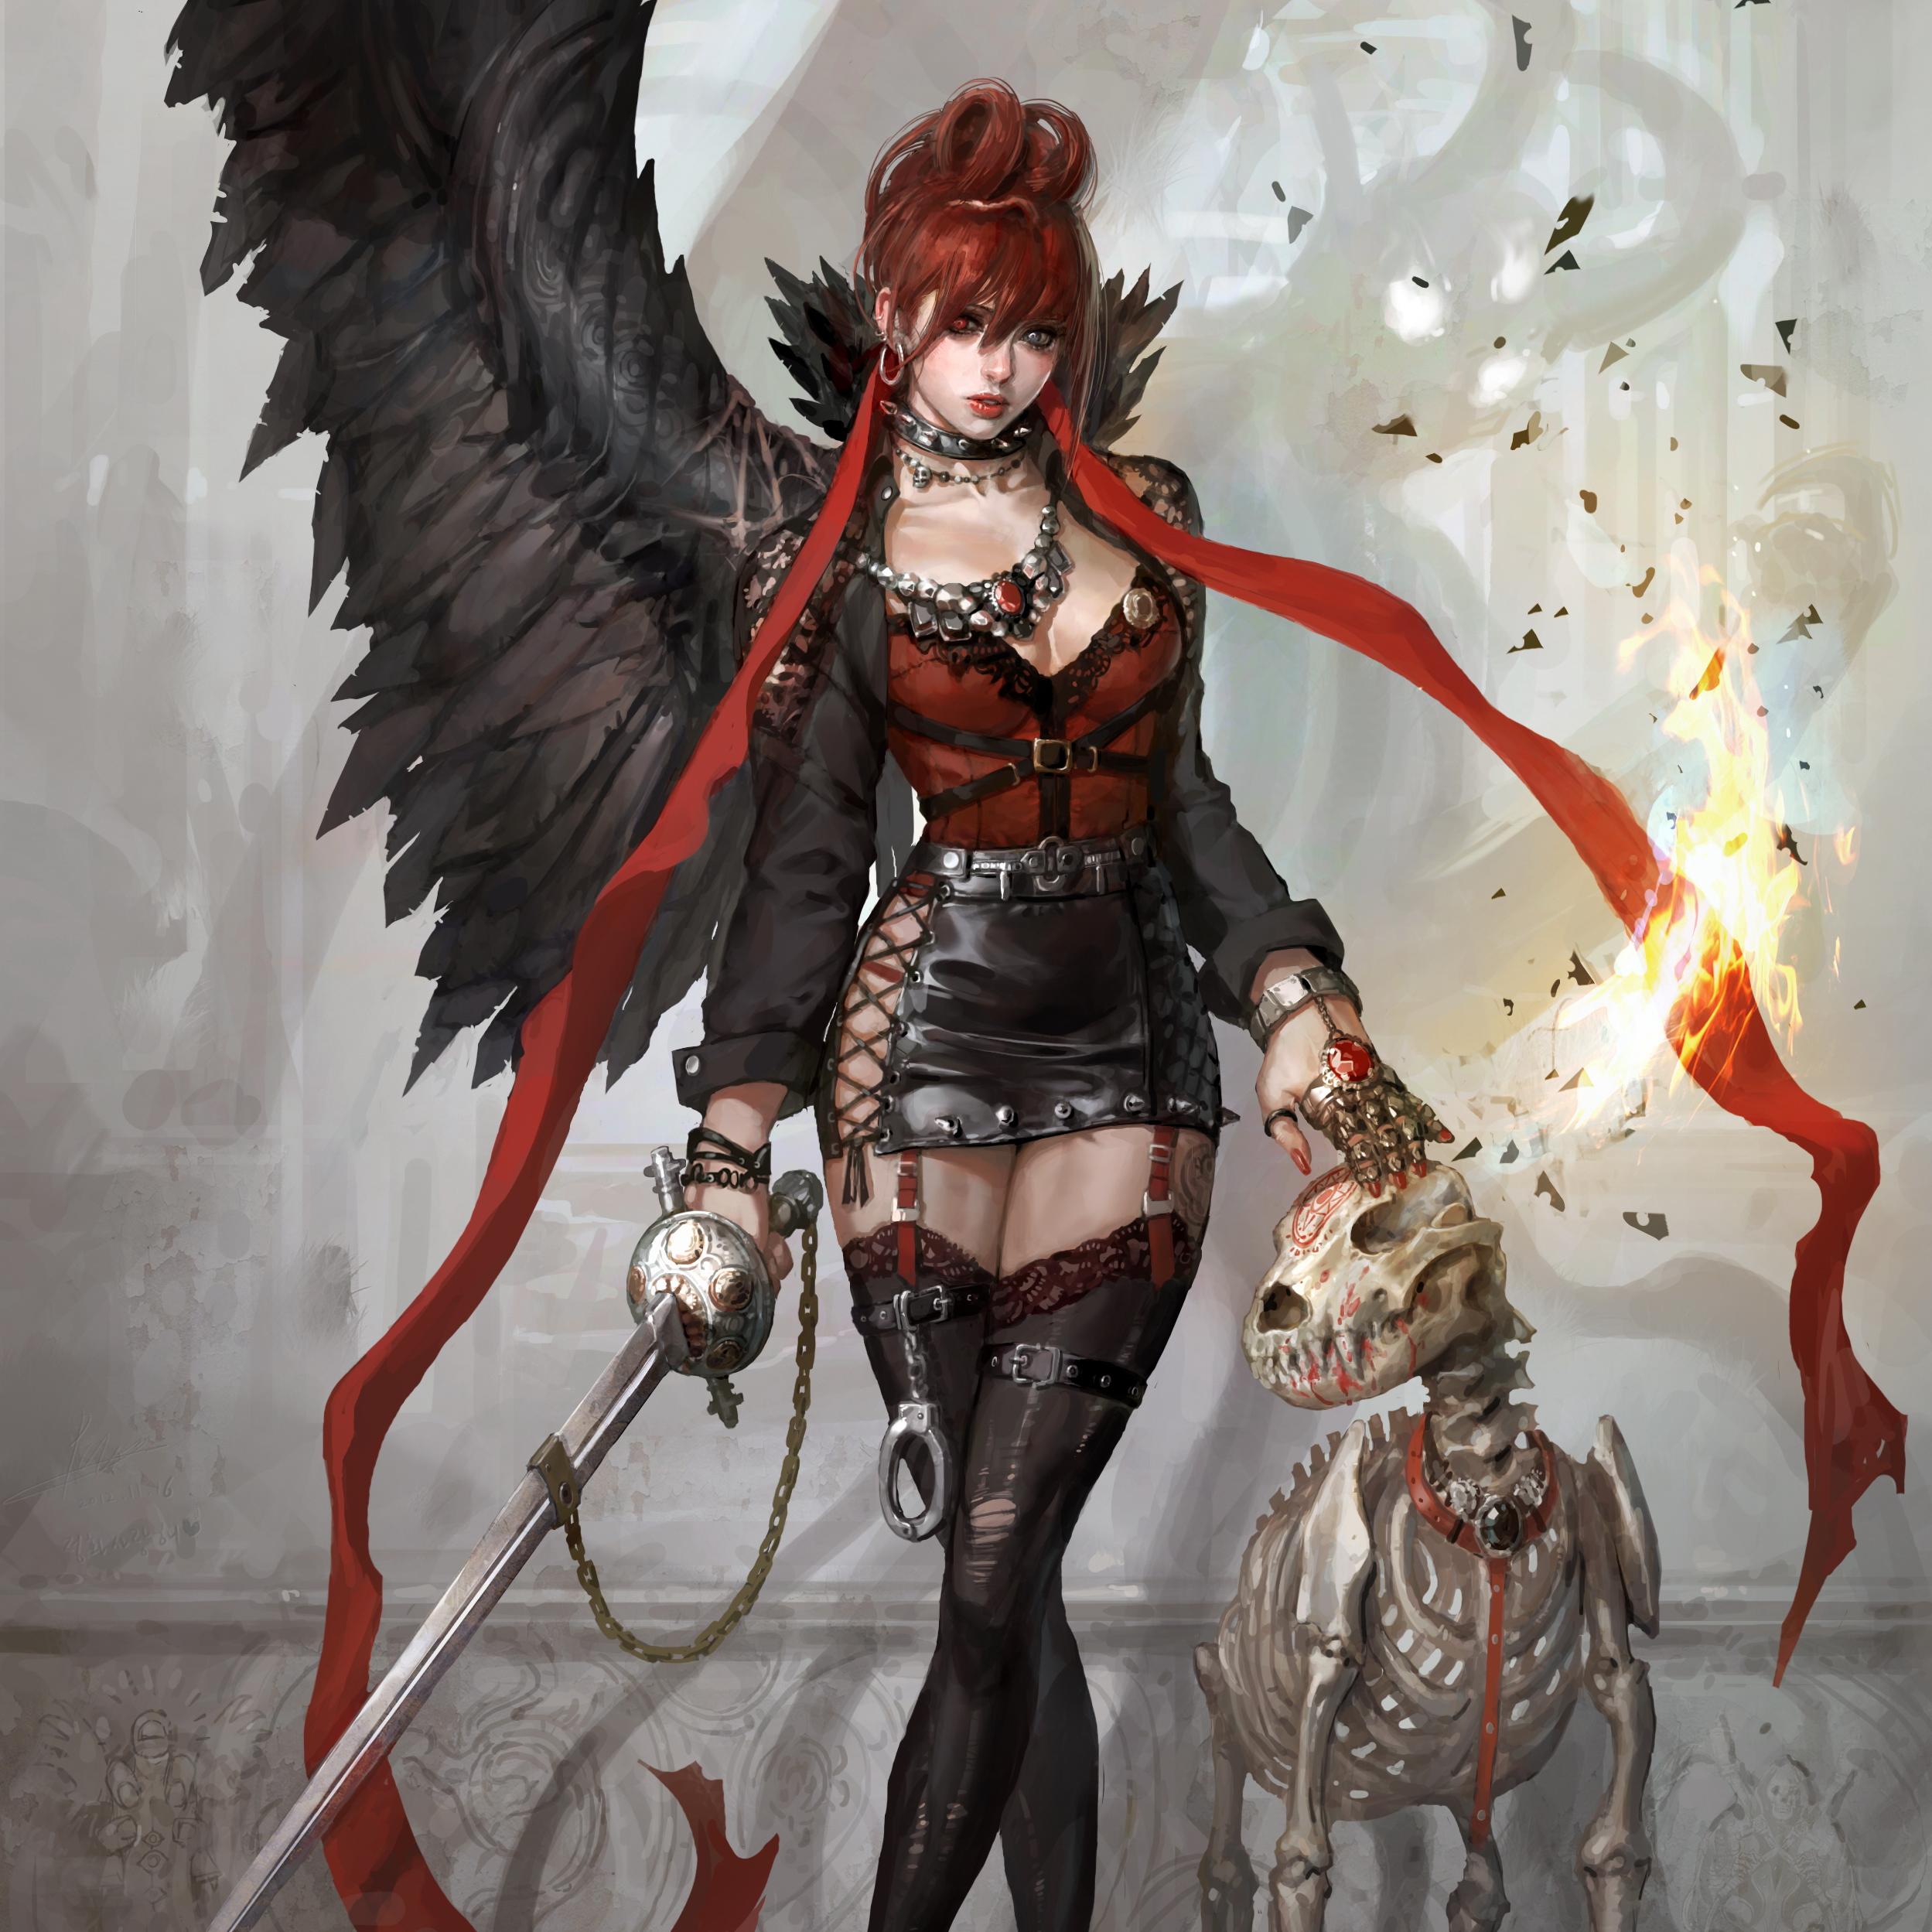 Whorelore redhead warrior erotica image